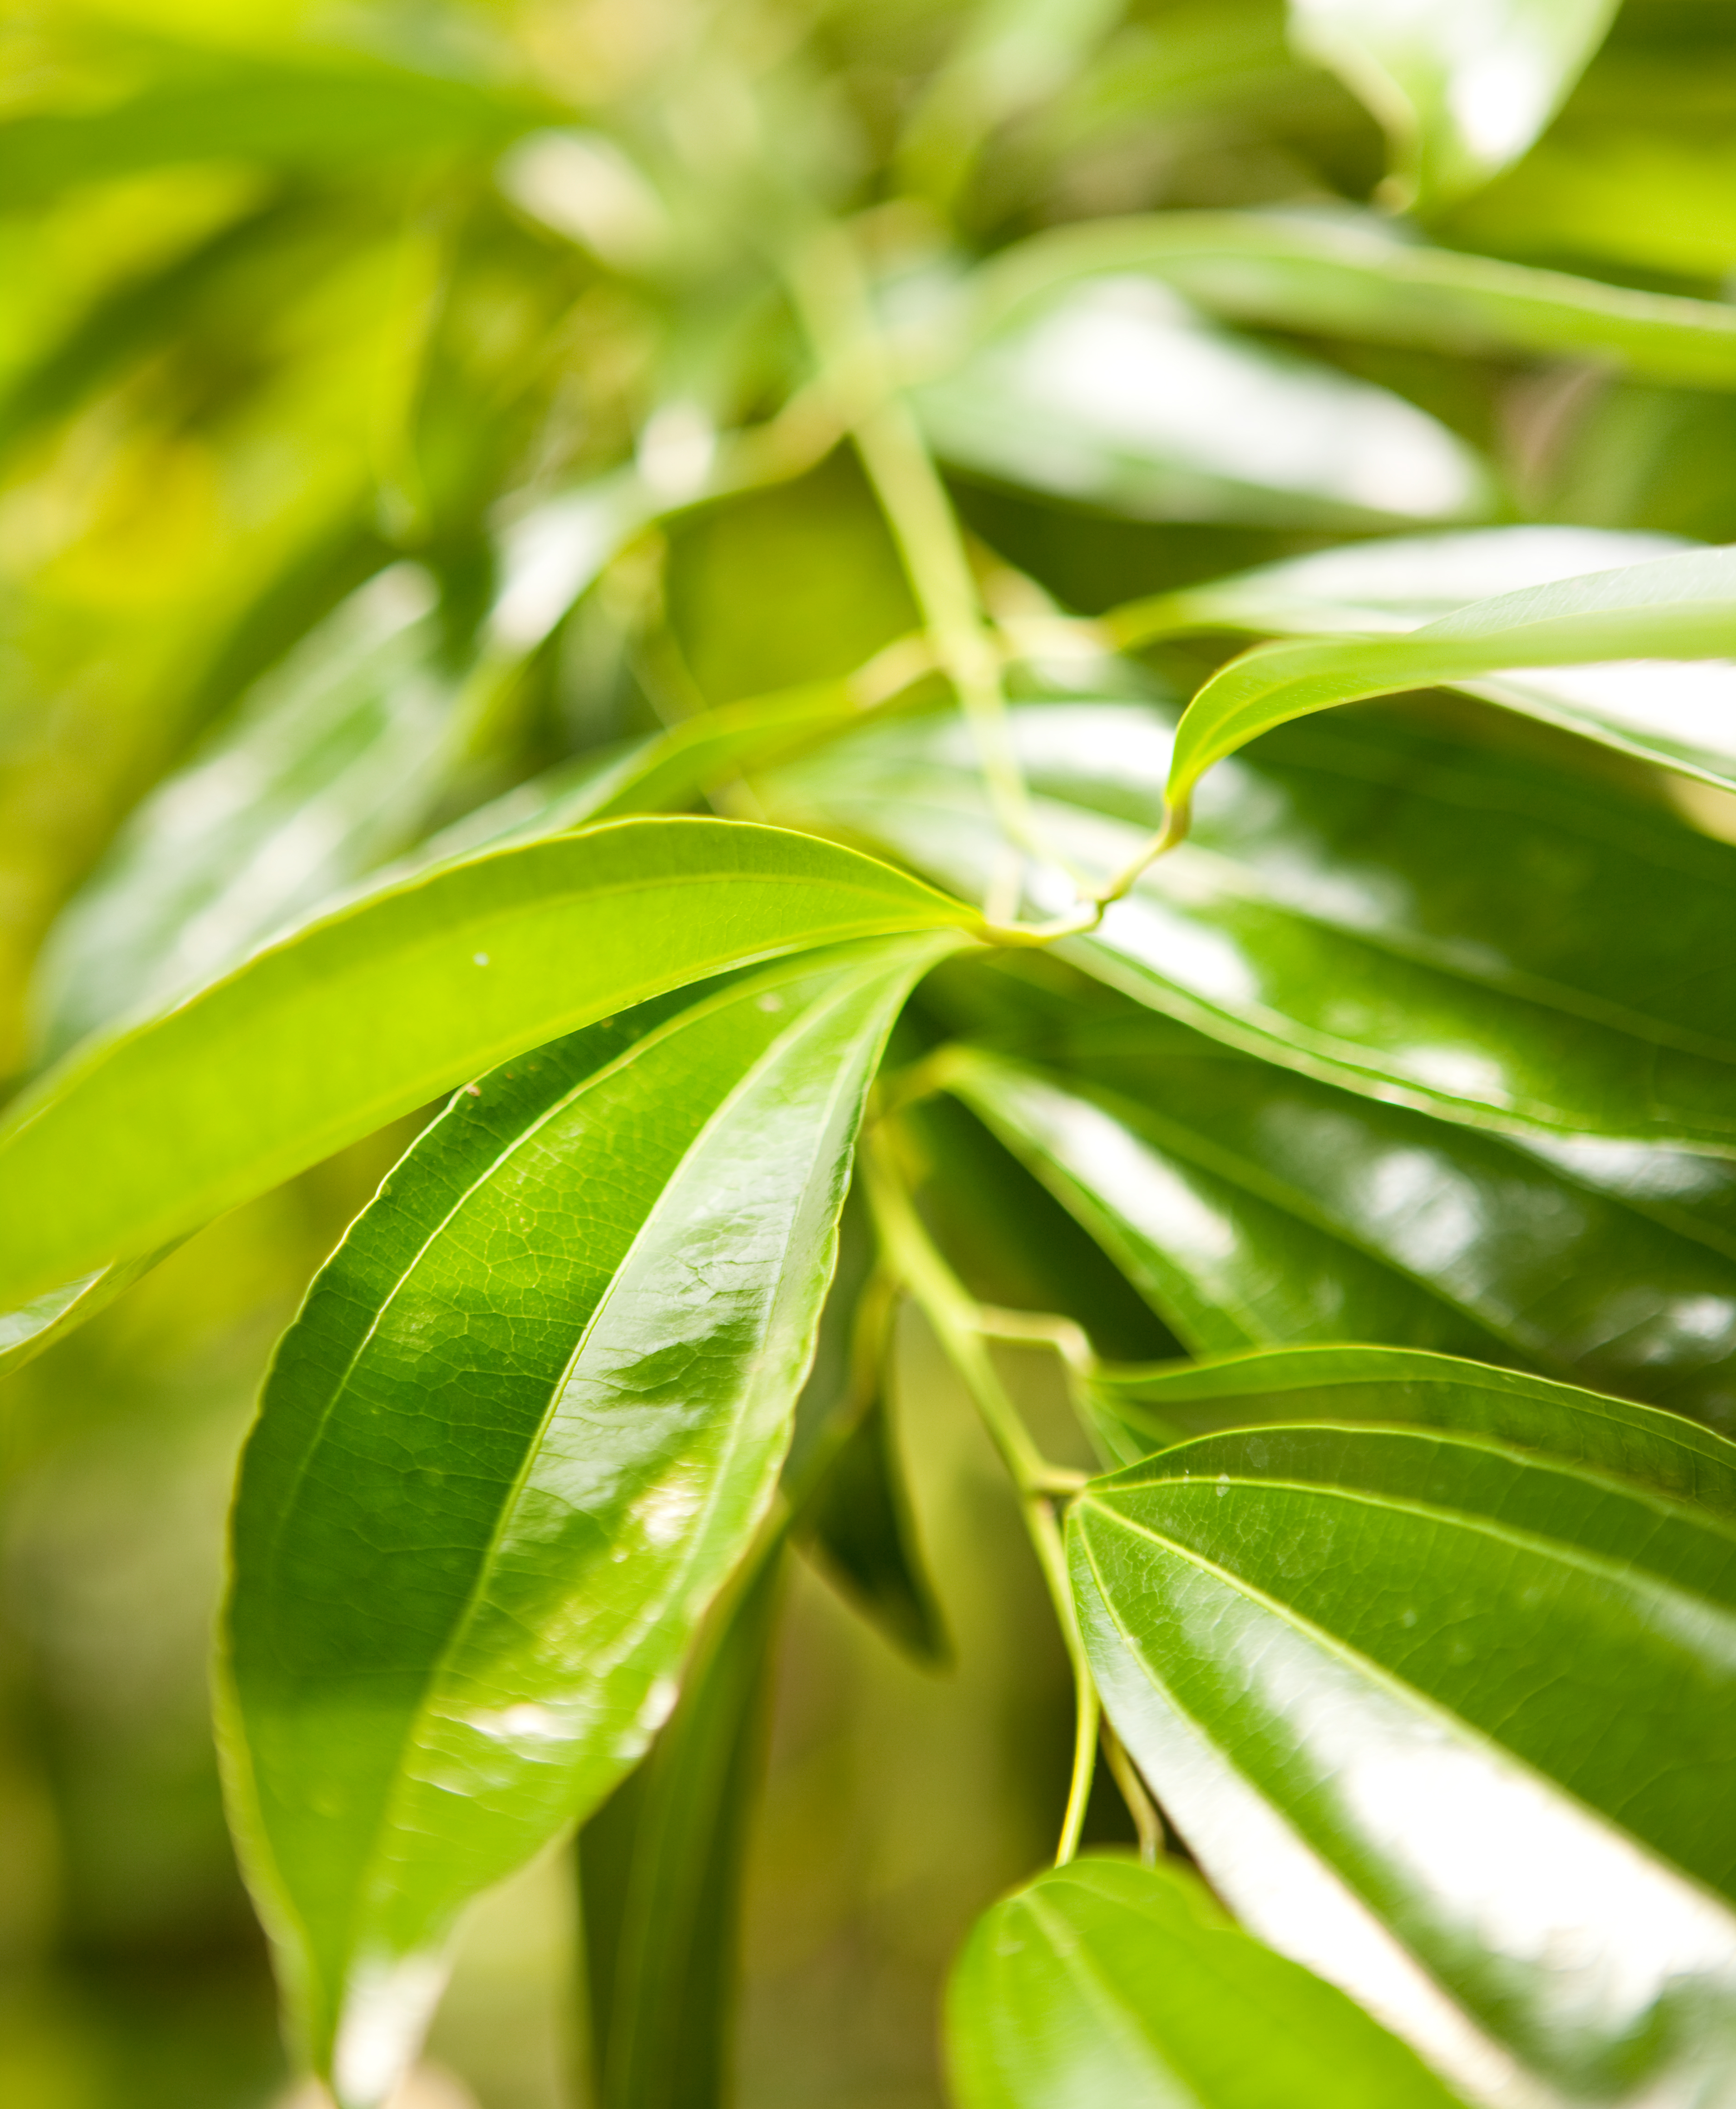 Green Leaves, Fresh, Green, Leaves, Nature, HQ Photo